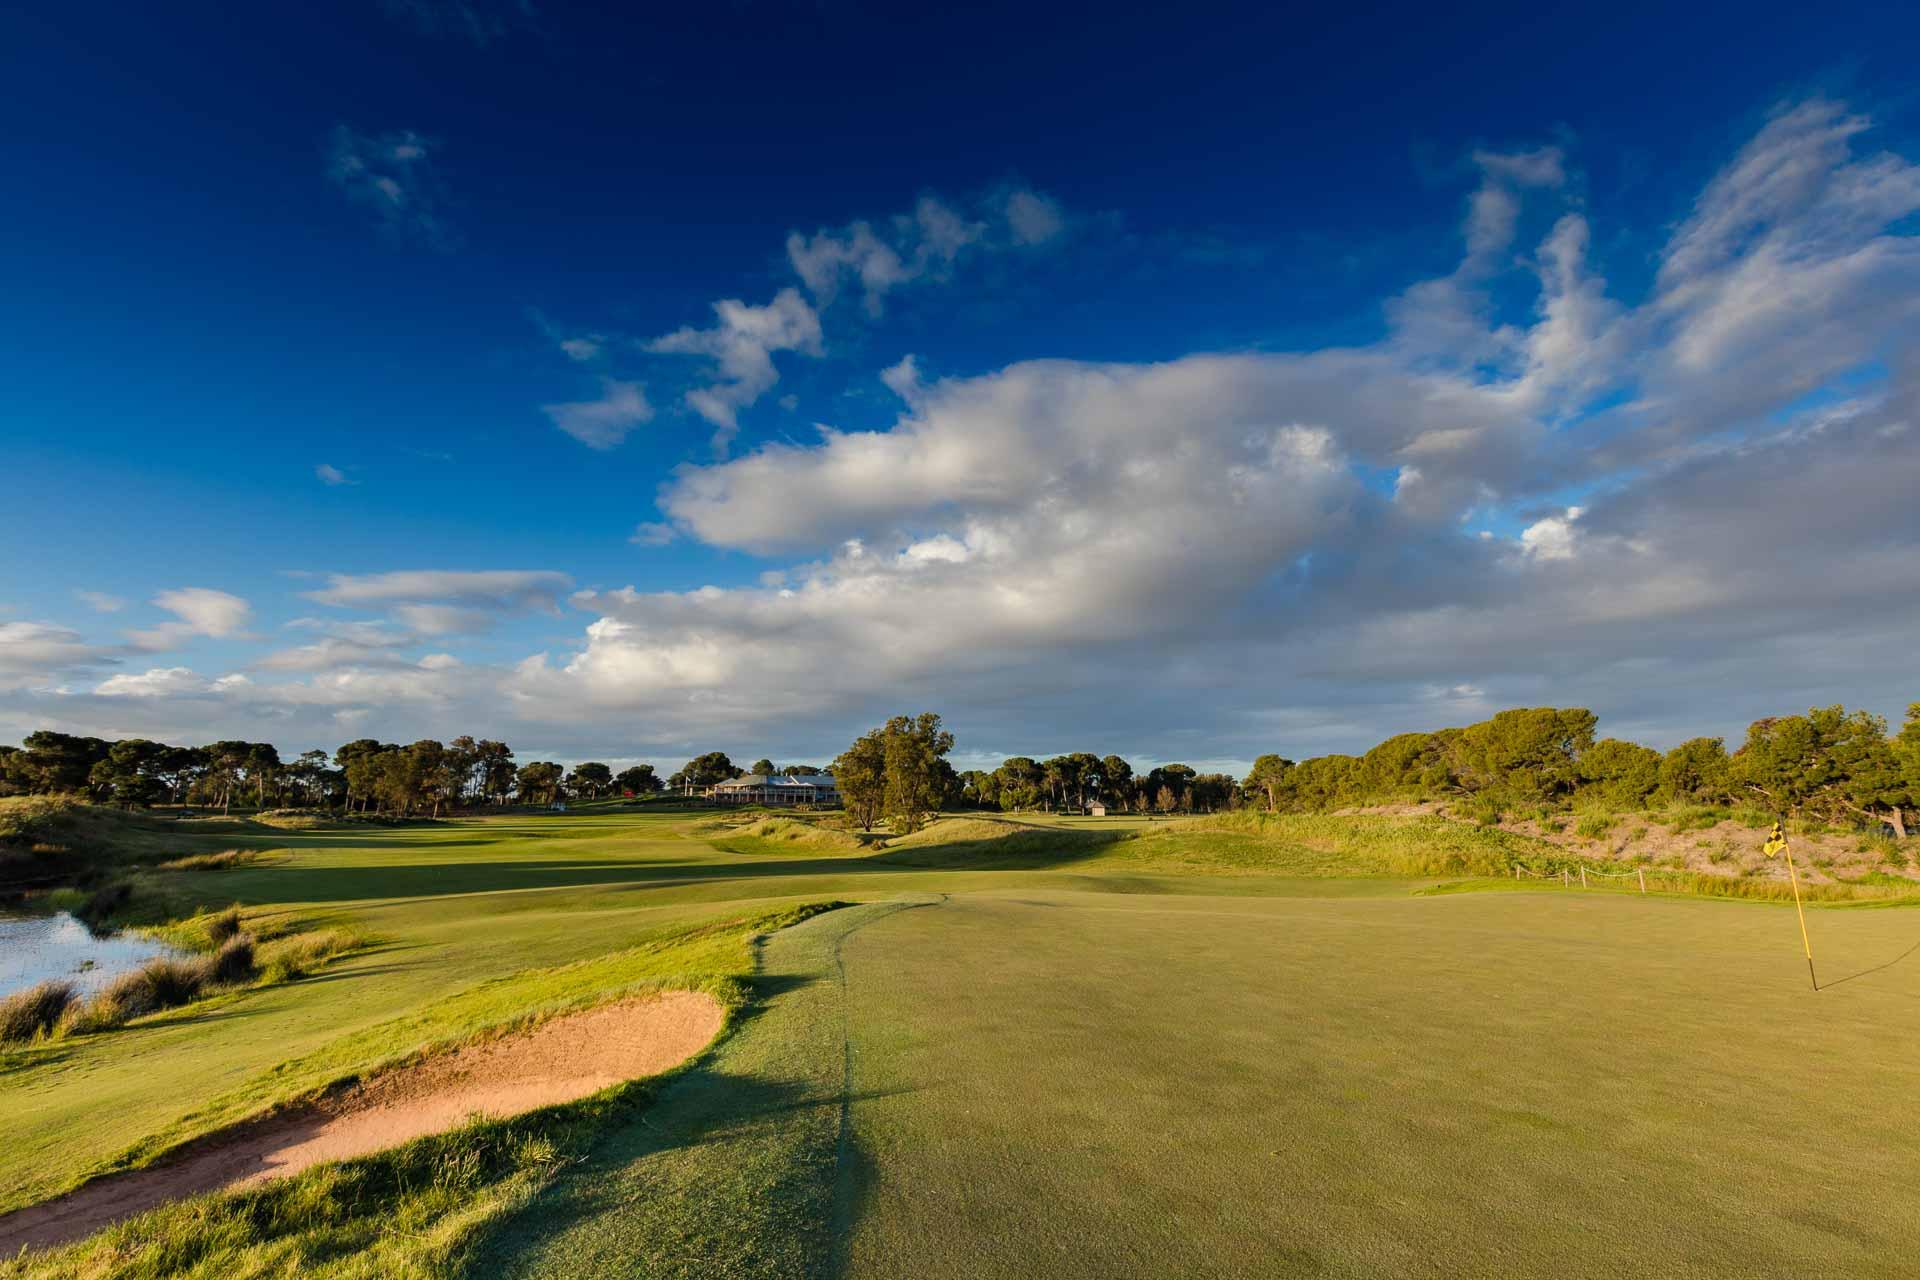 Glenelg Golf Club - Par 4, 1st Hole / Photo: David Brand